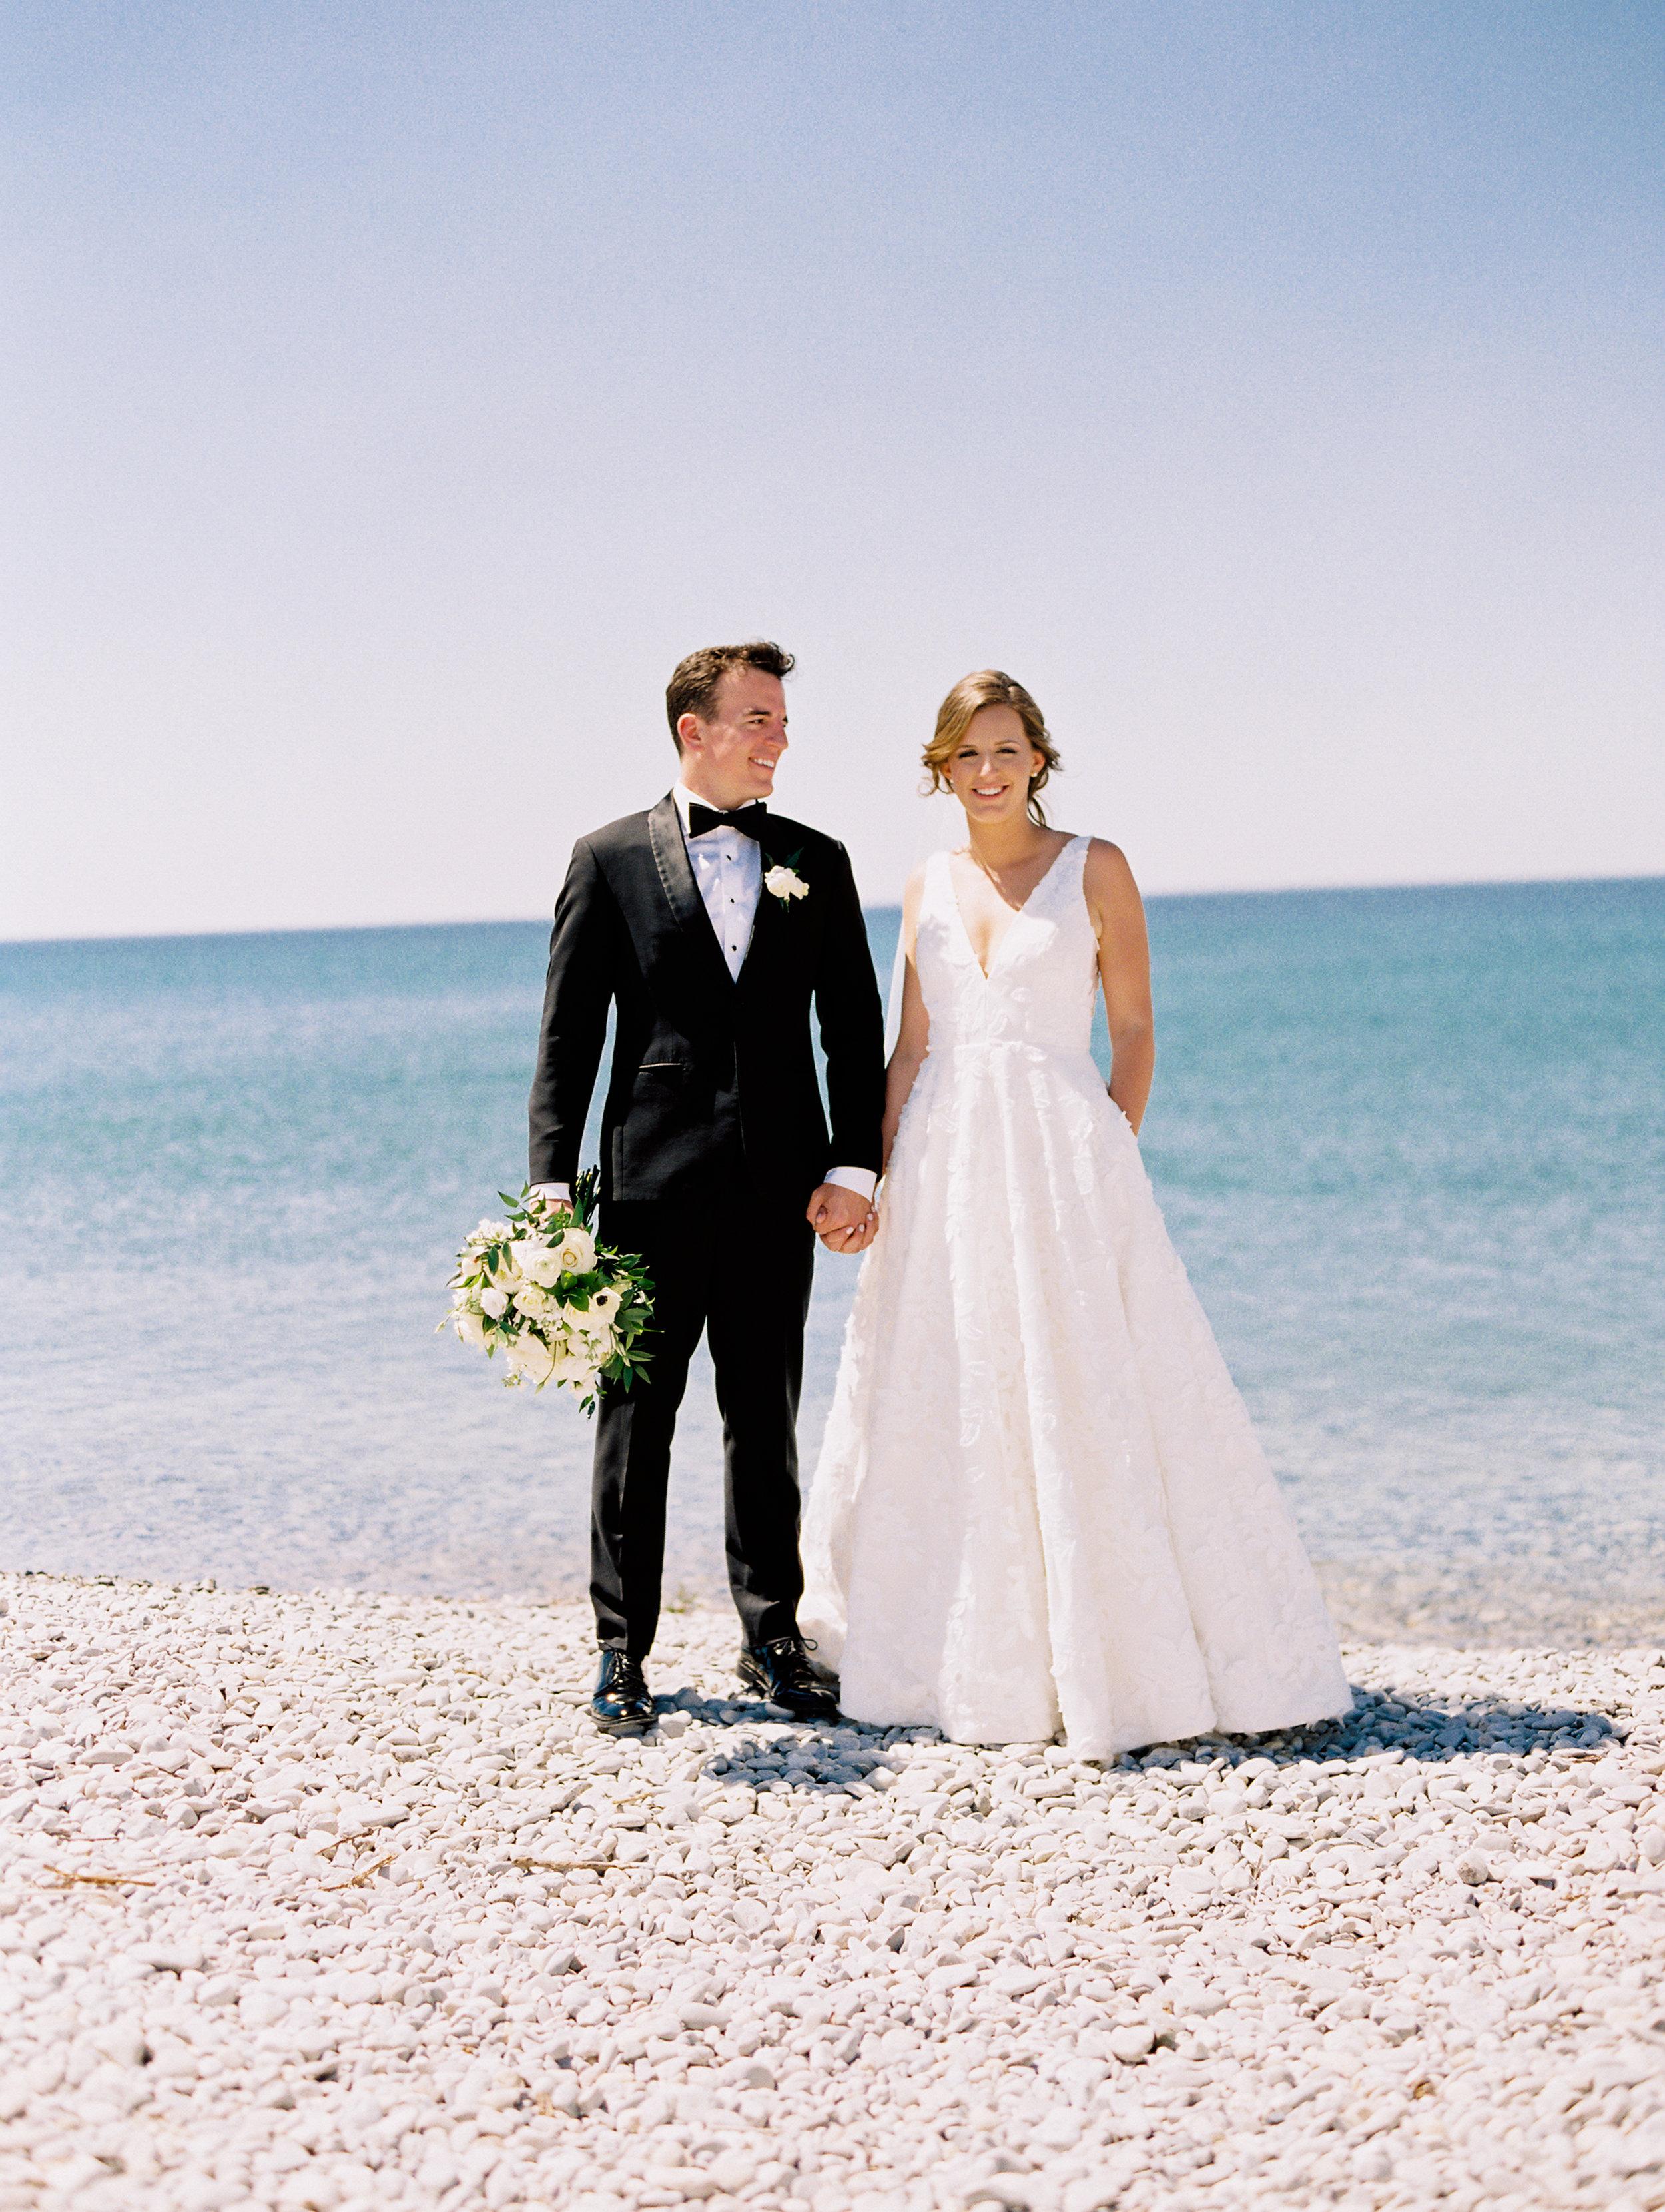 DeGuilio+Wedding+Bridal+Partyf-73.jpg